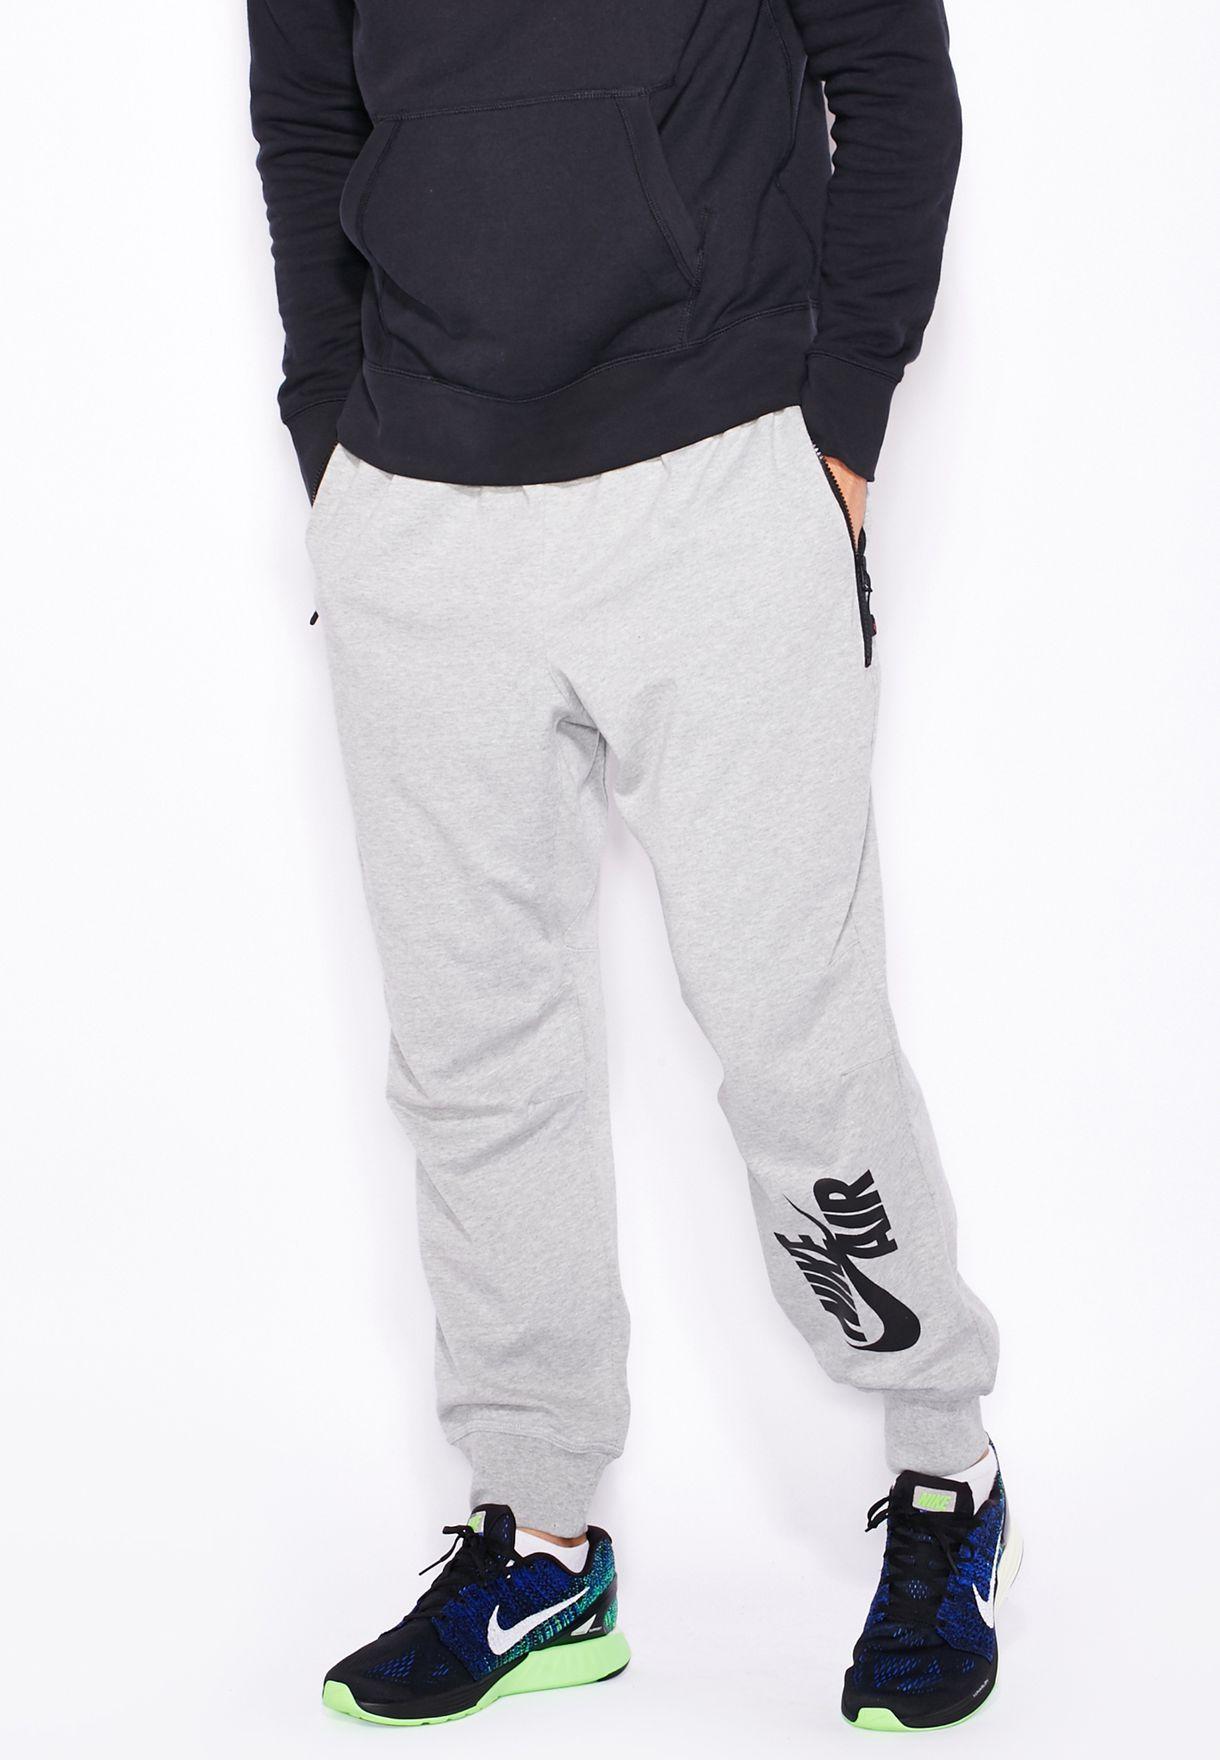 b2146a481143 Shop Nike grey Air Pivot V3 Sweatpants 728291-063 for Men in ...